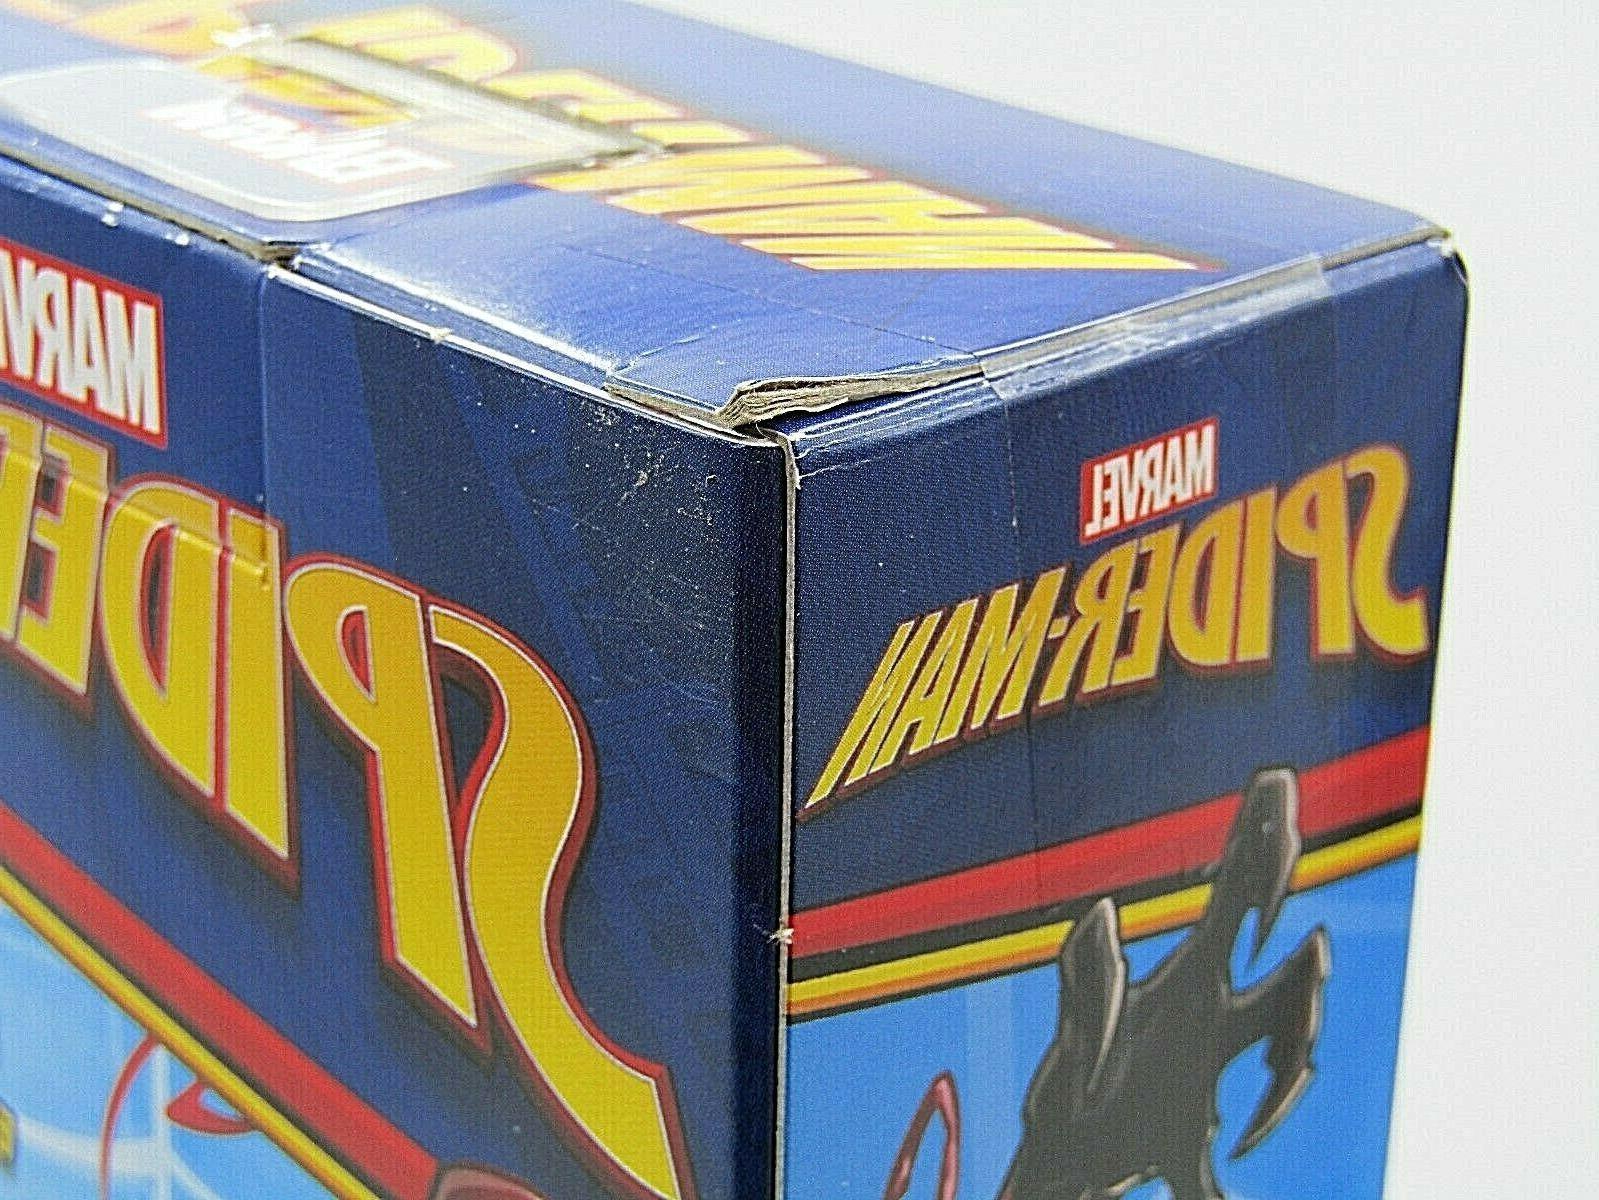 Marvel Spider-Man Titan Hero Series Carnage Action